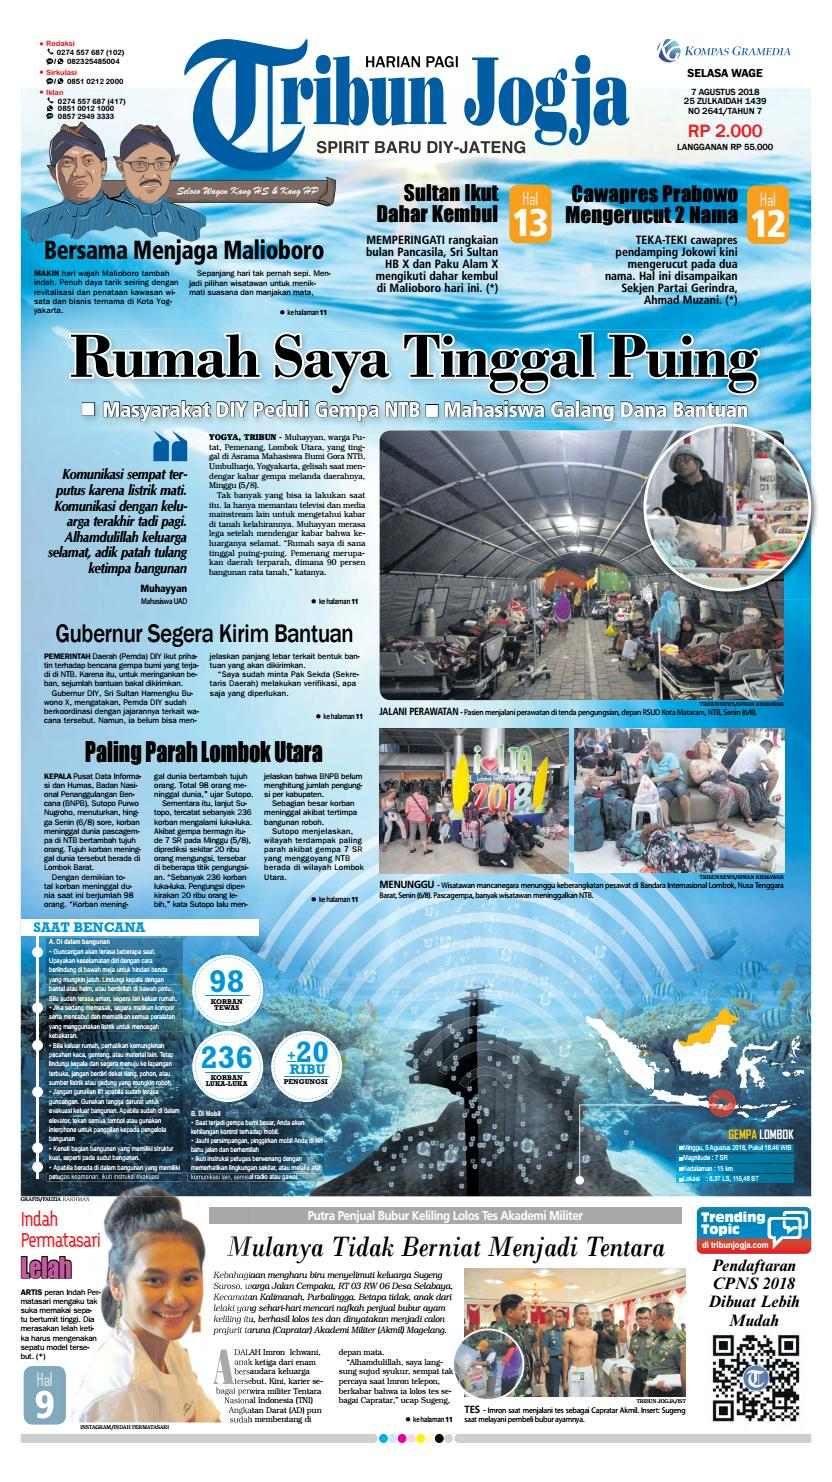 Tribun Jogja 07 08 2018 By Issuu Snack Gayem Pangsit Bantal Imut Bdg